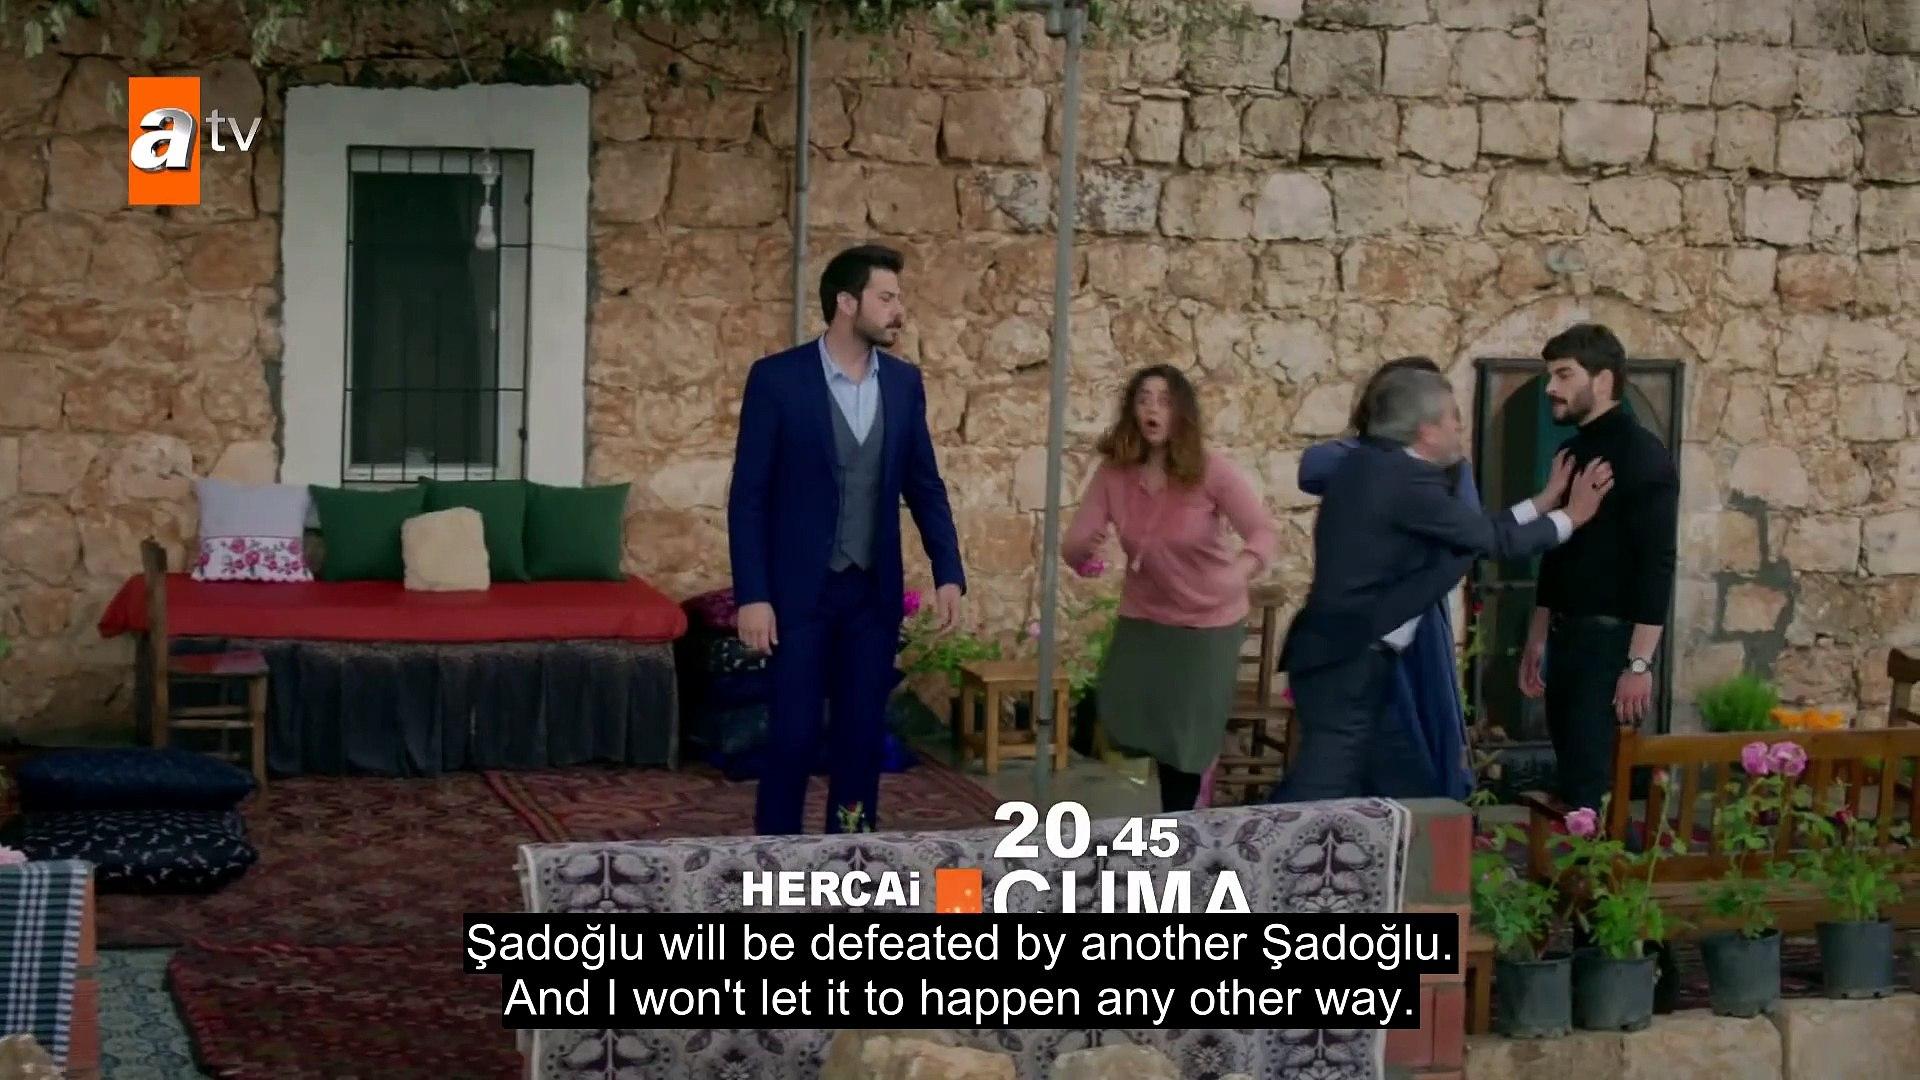 Hercai 9. Trailer 1 (English subtitles)